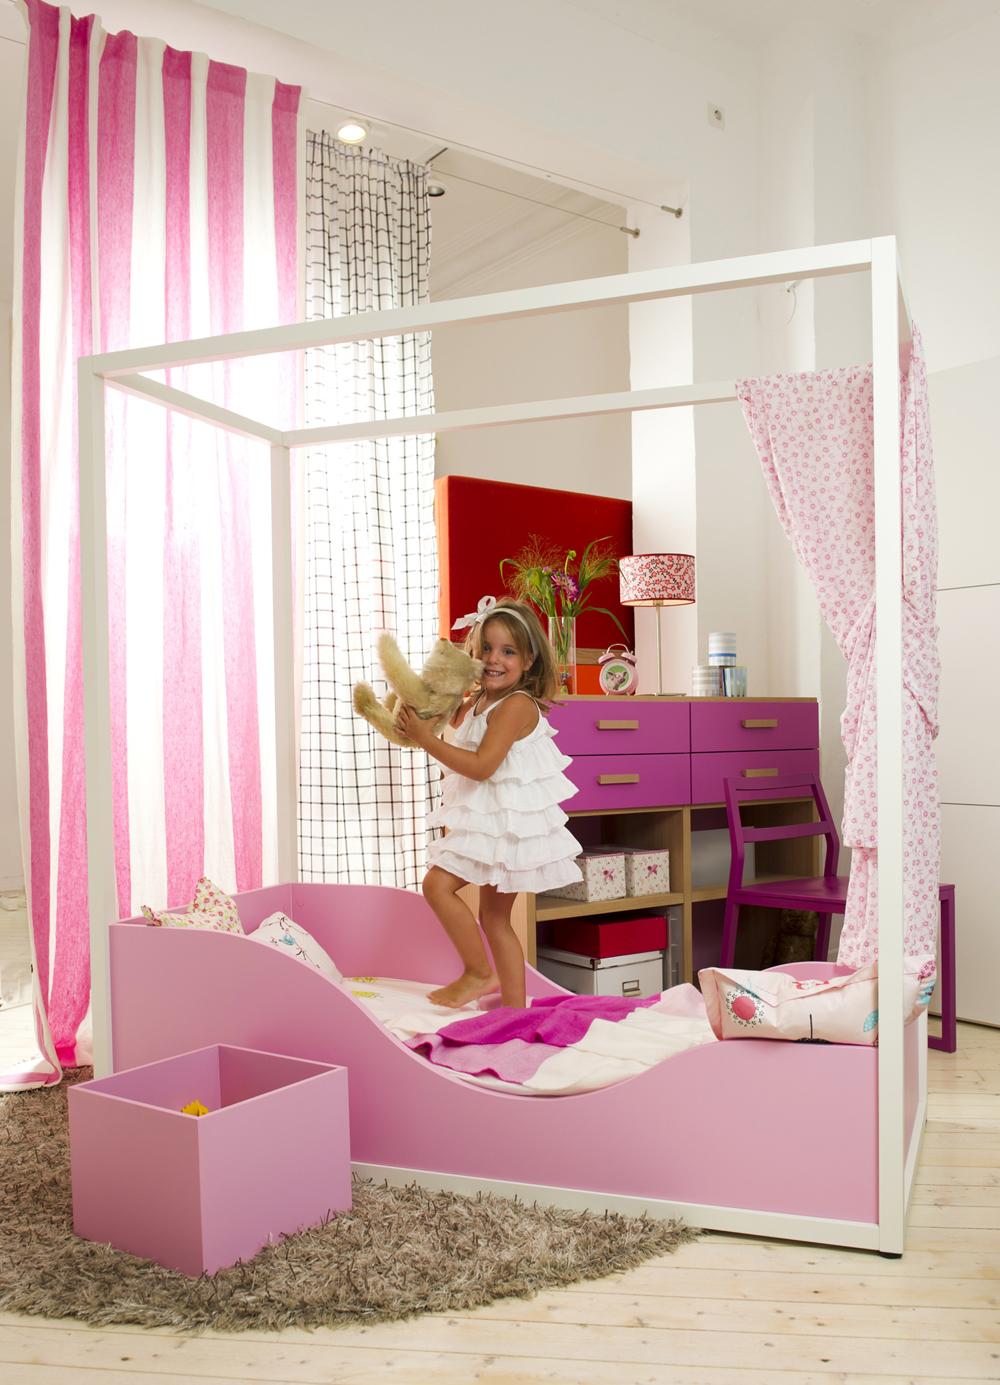 Full Size of Coole Kinderbetten Hochwertige Und Jugendbetten T Shirt Sprüche T Shirt Betten Wohnzimmer Coole Kinderbetten